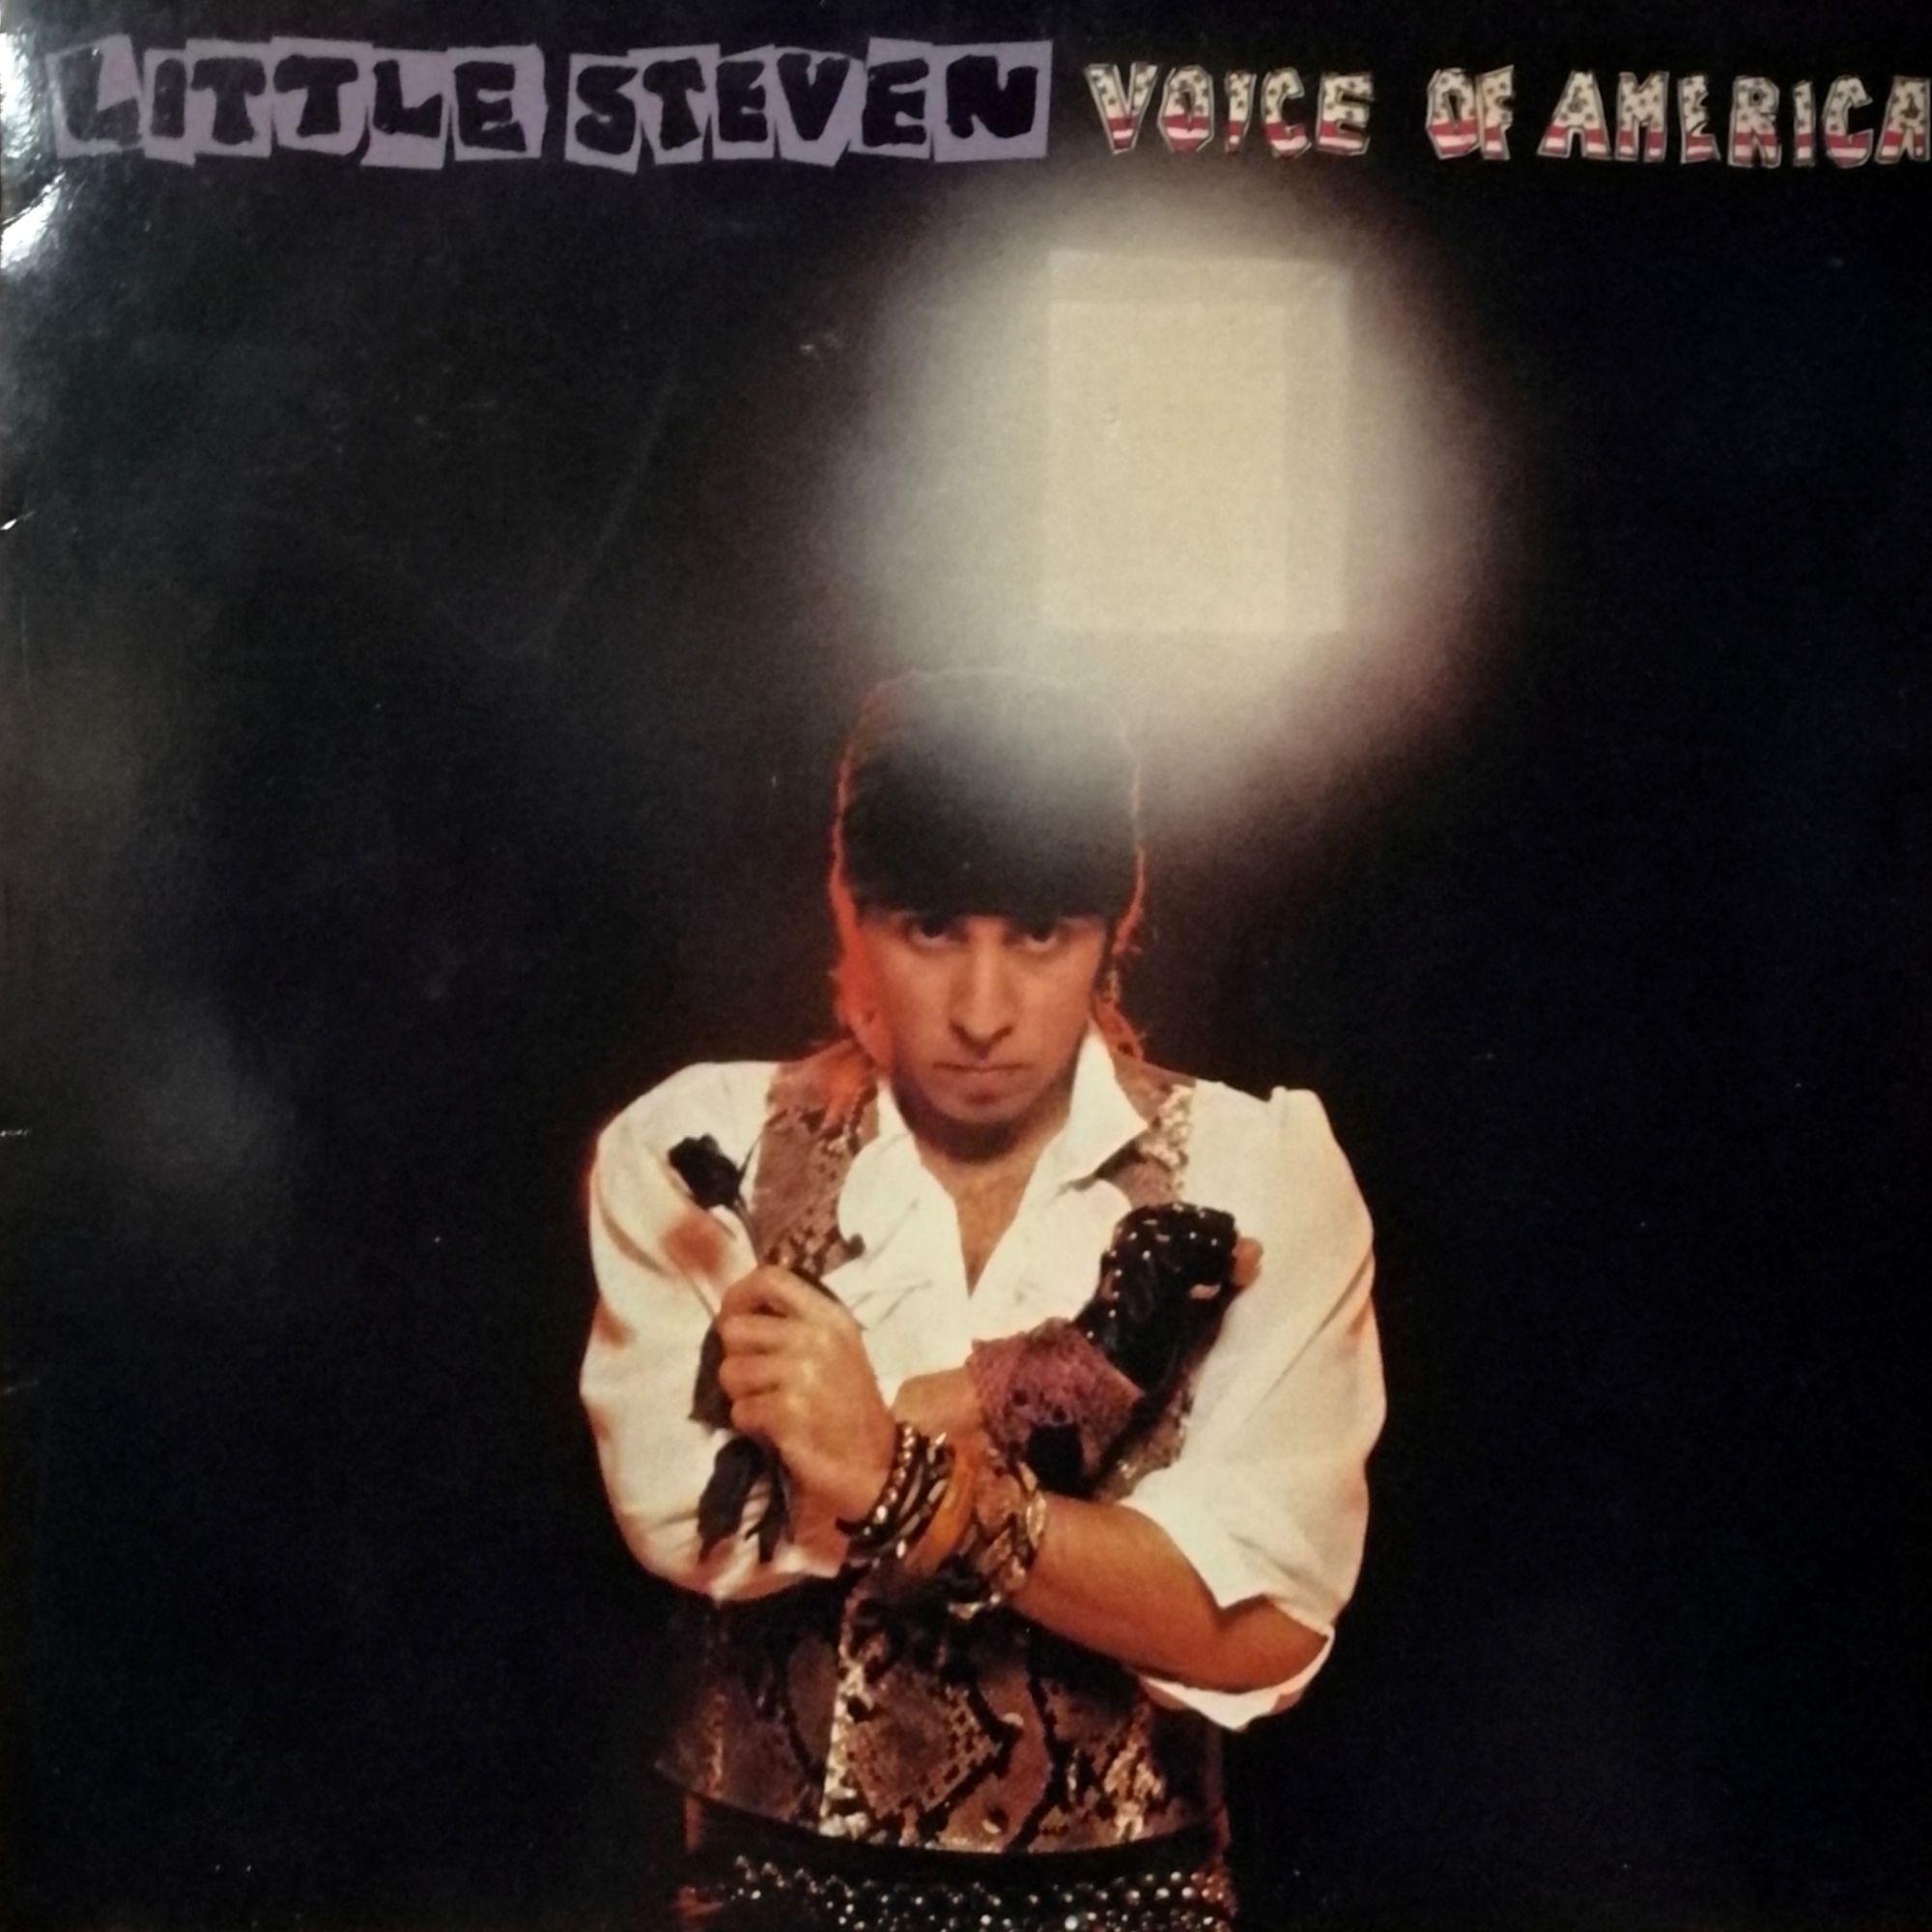 Little Steven Voice of America LP undefined